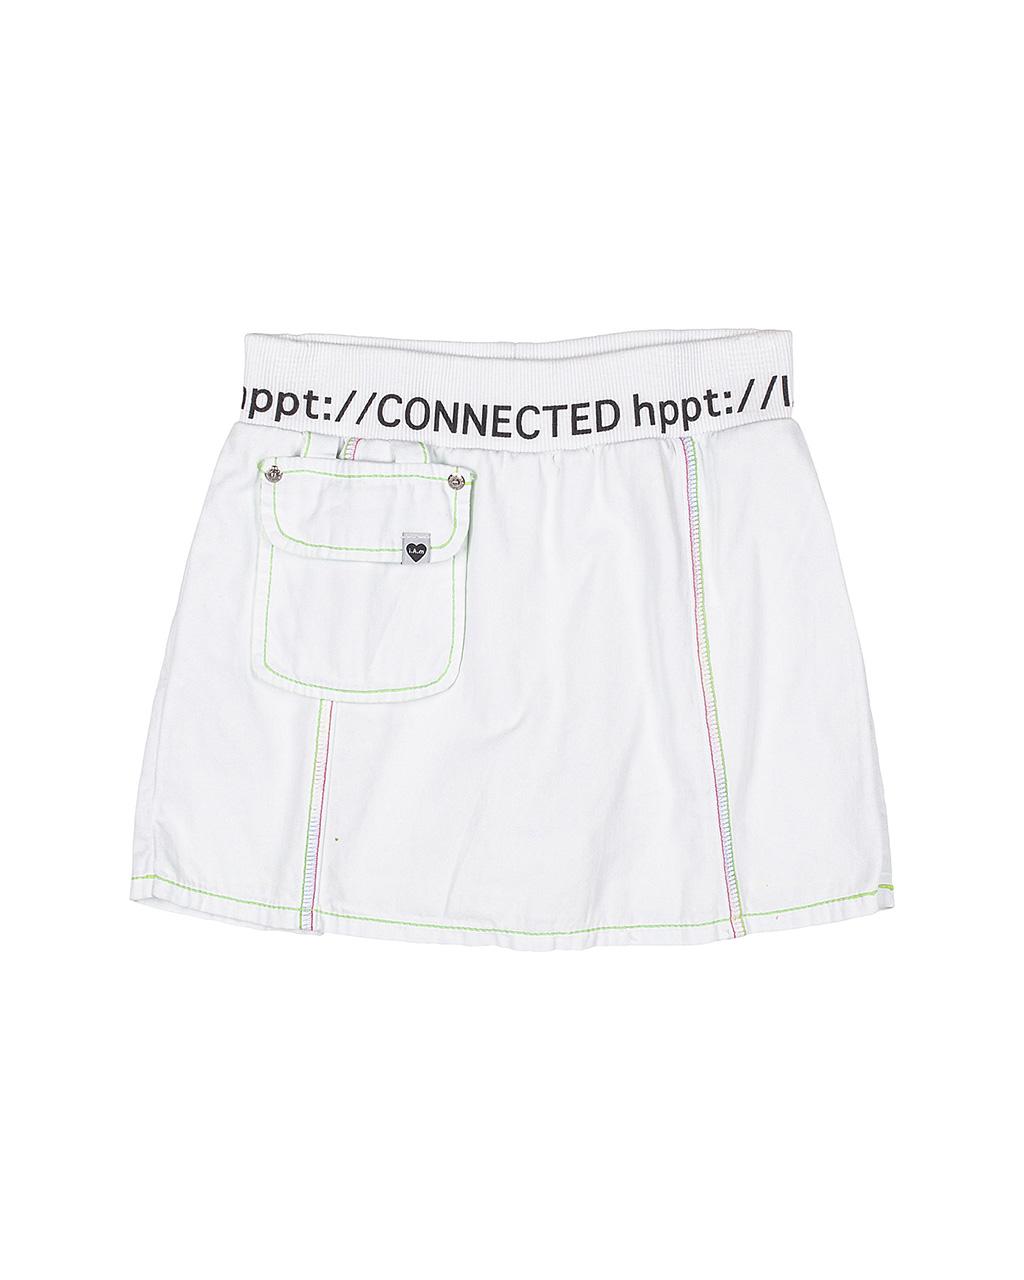 Shorts Saia Teen Linhas Neon Off White I Am